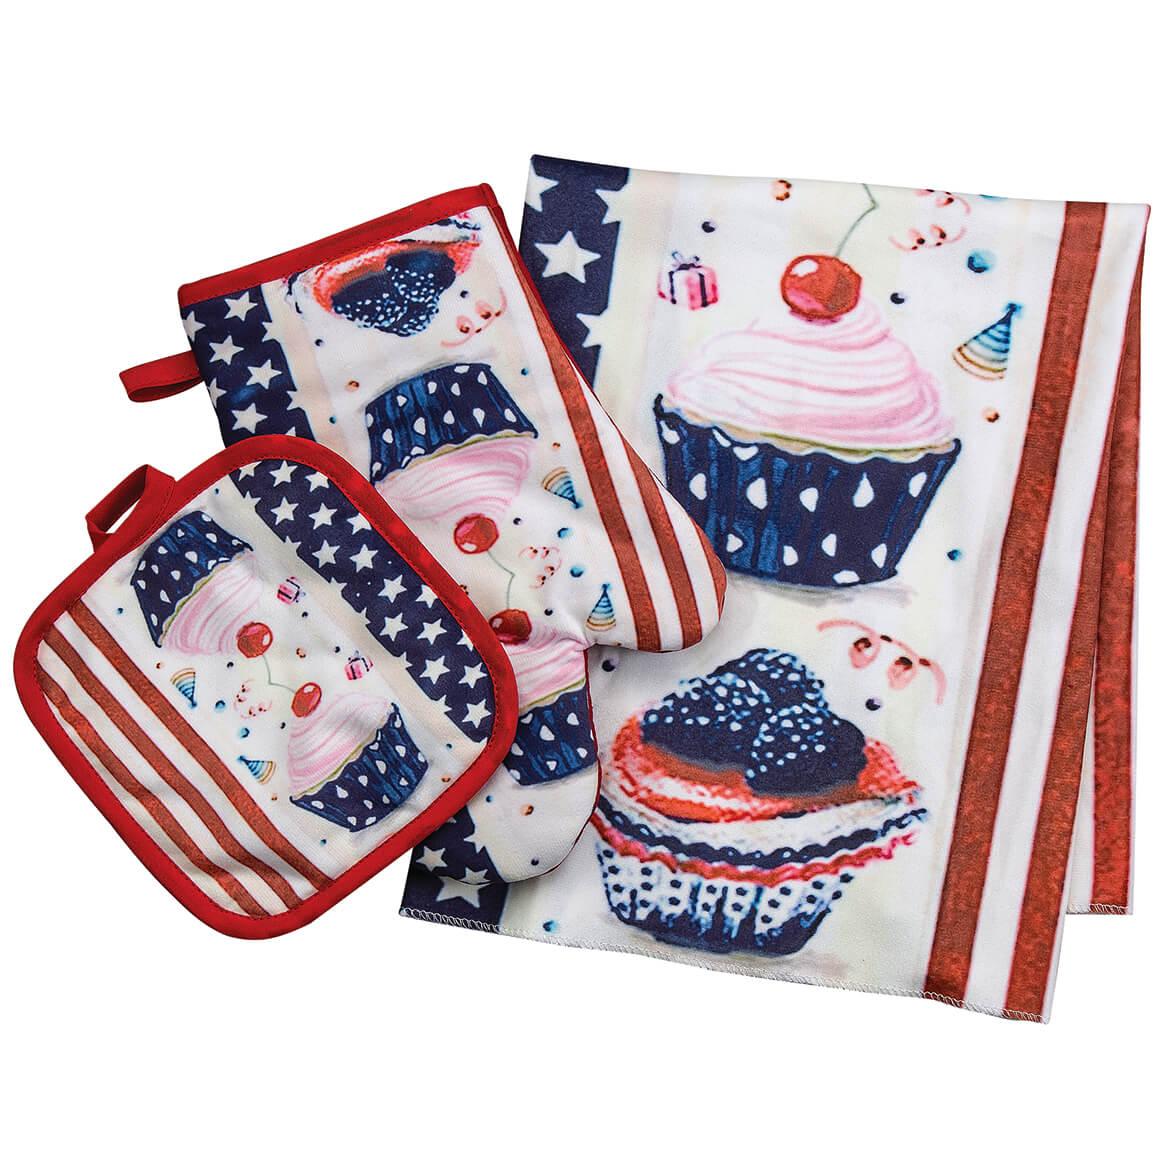 Patriotic Cupcake Kitchen Towel, Oven Mitt & Pot Holder Set-371628